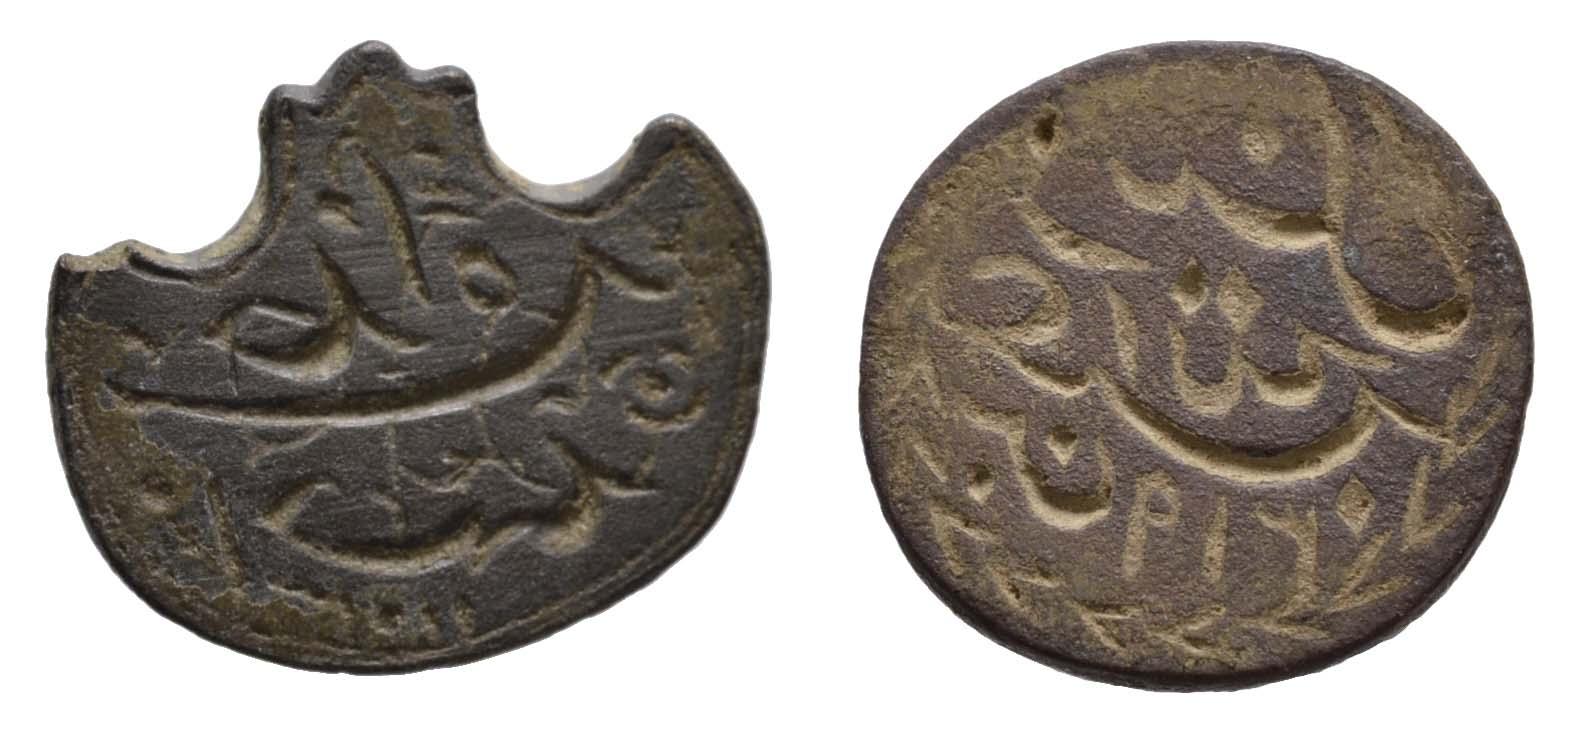 Lot 398 - Antike Antike Objekte -  Auktionshaus Ulrich Felzmann GmbH & Co. KG Coins single lots